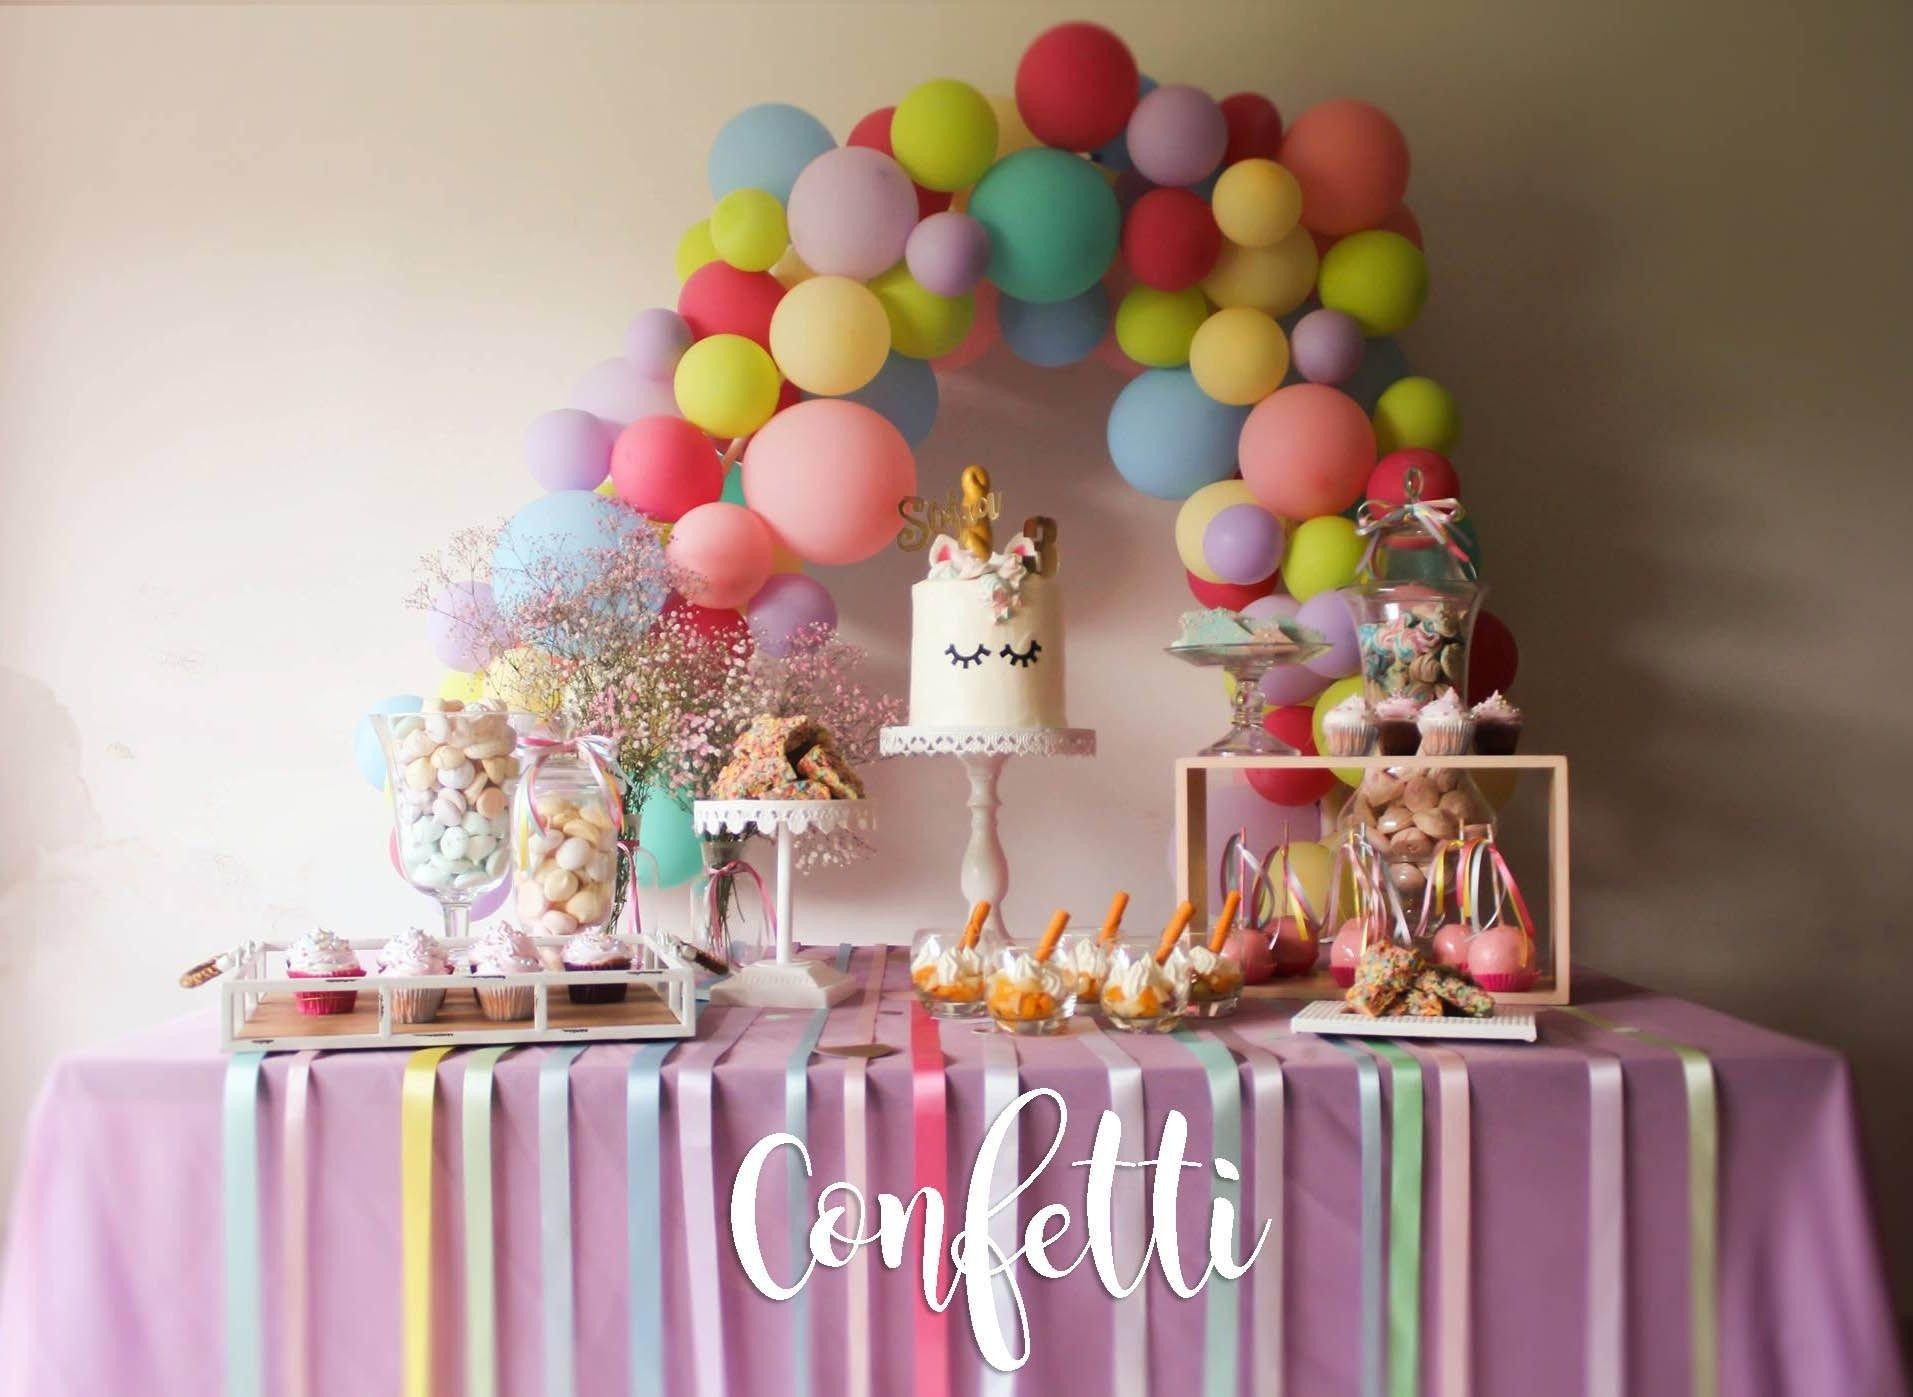 10 Most Popular Birthday Party Ideas Richmond Va unicorn party ideas kids party colorful party fiesta de 2021